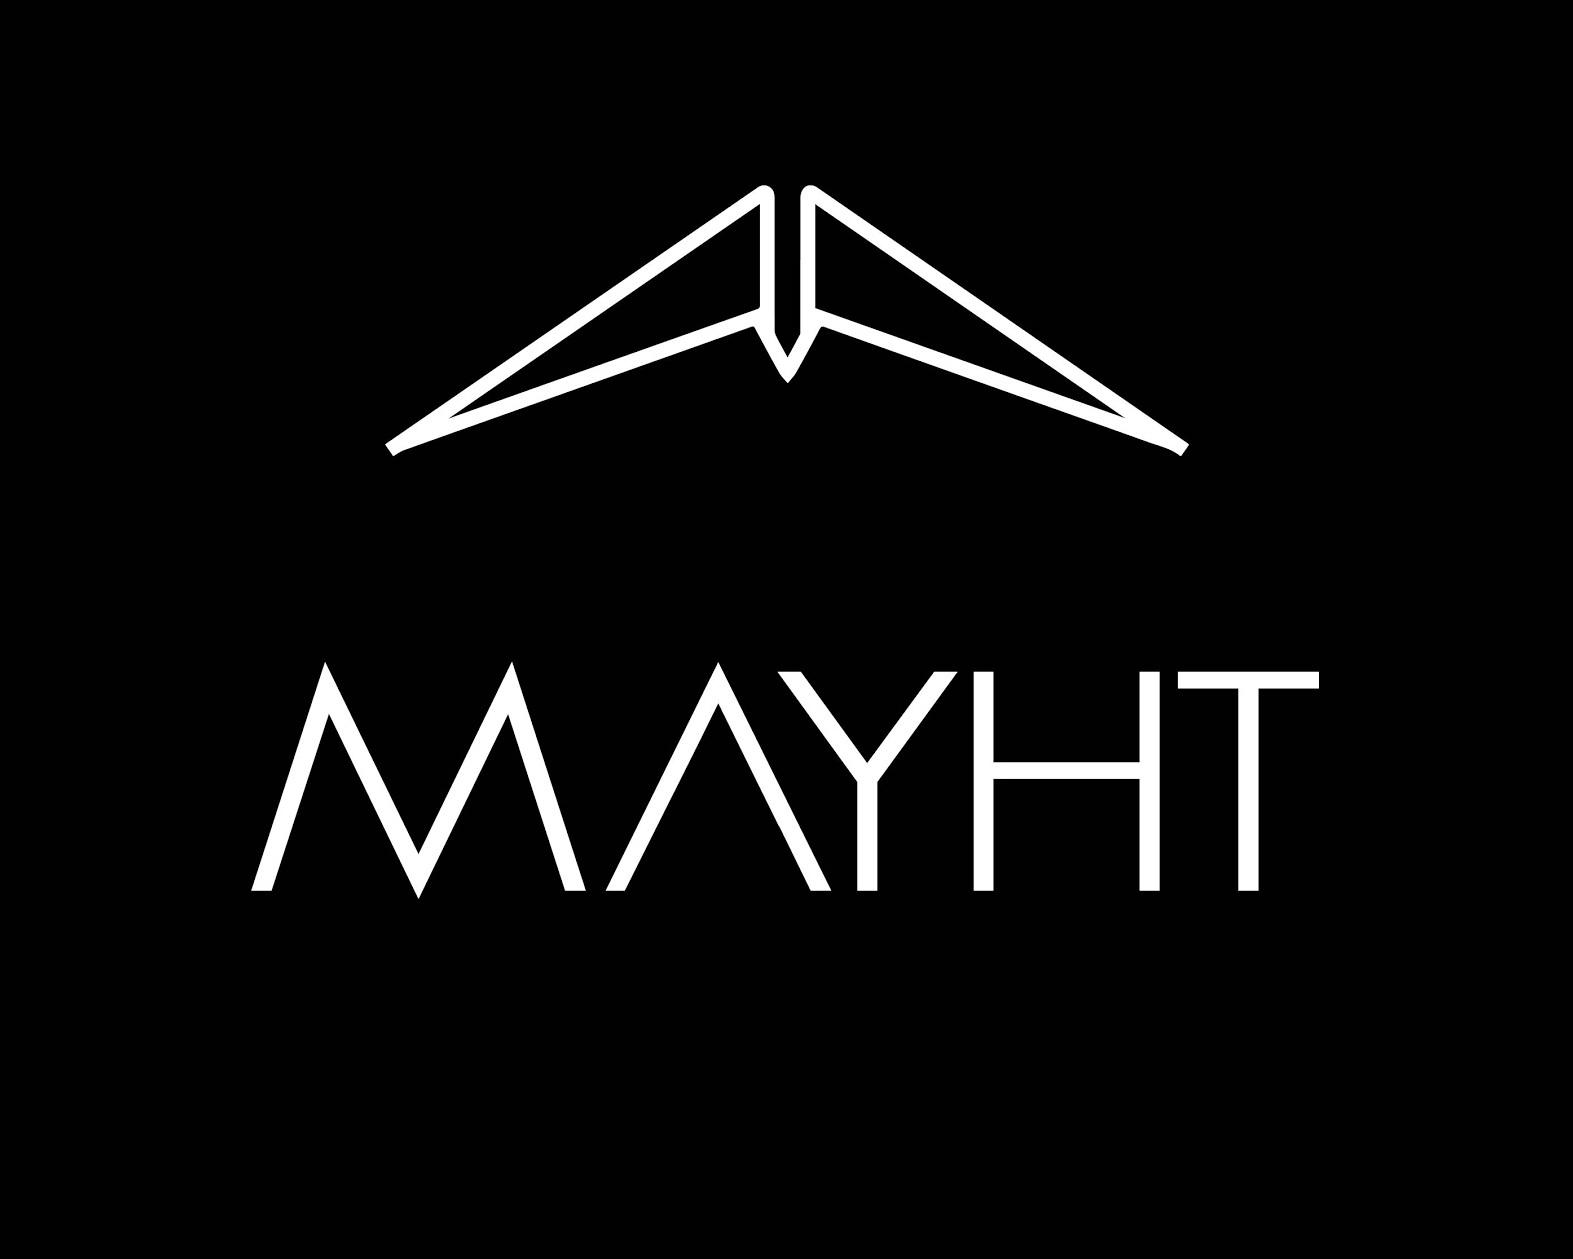 Mayht-logo+%281%29.jpg